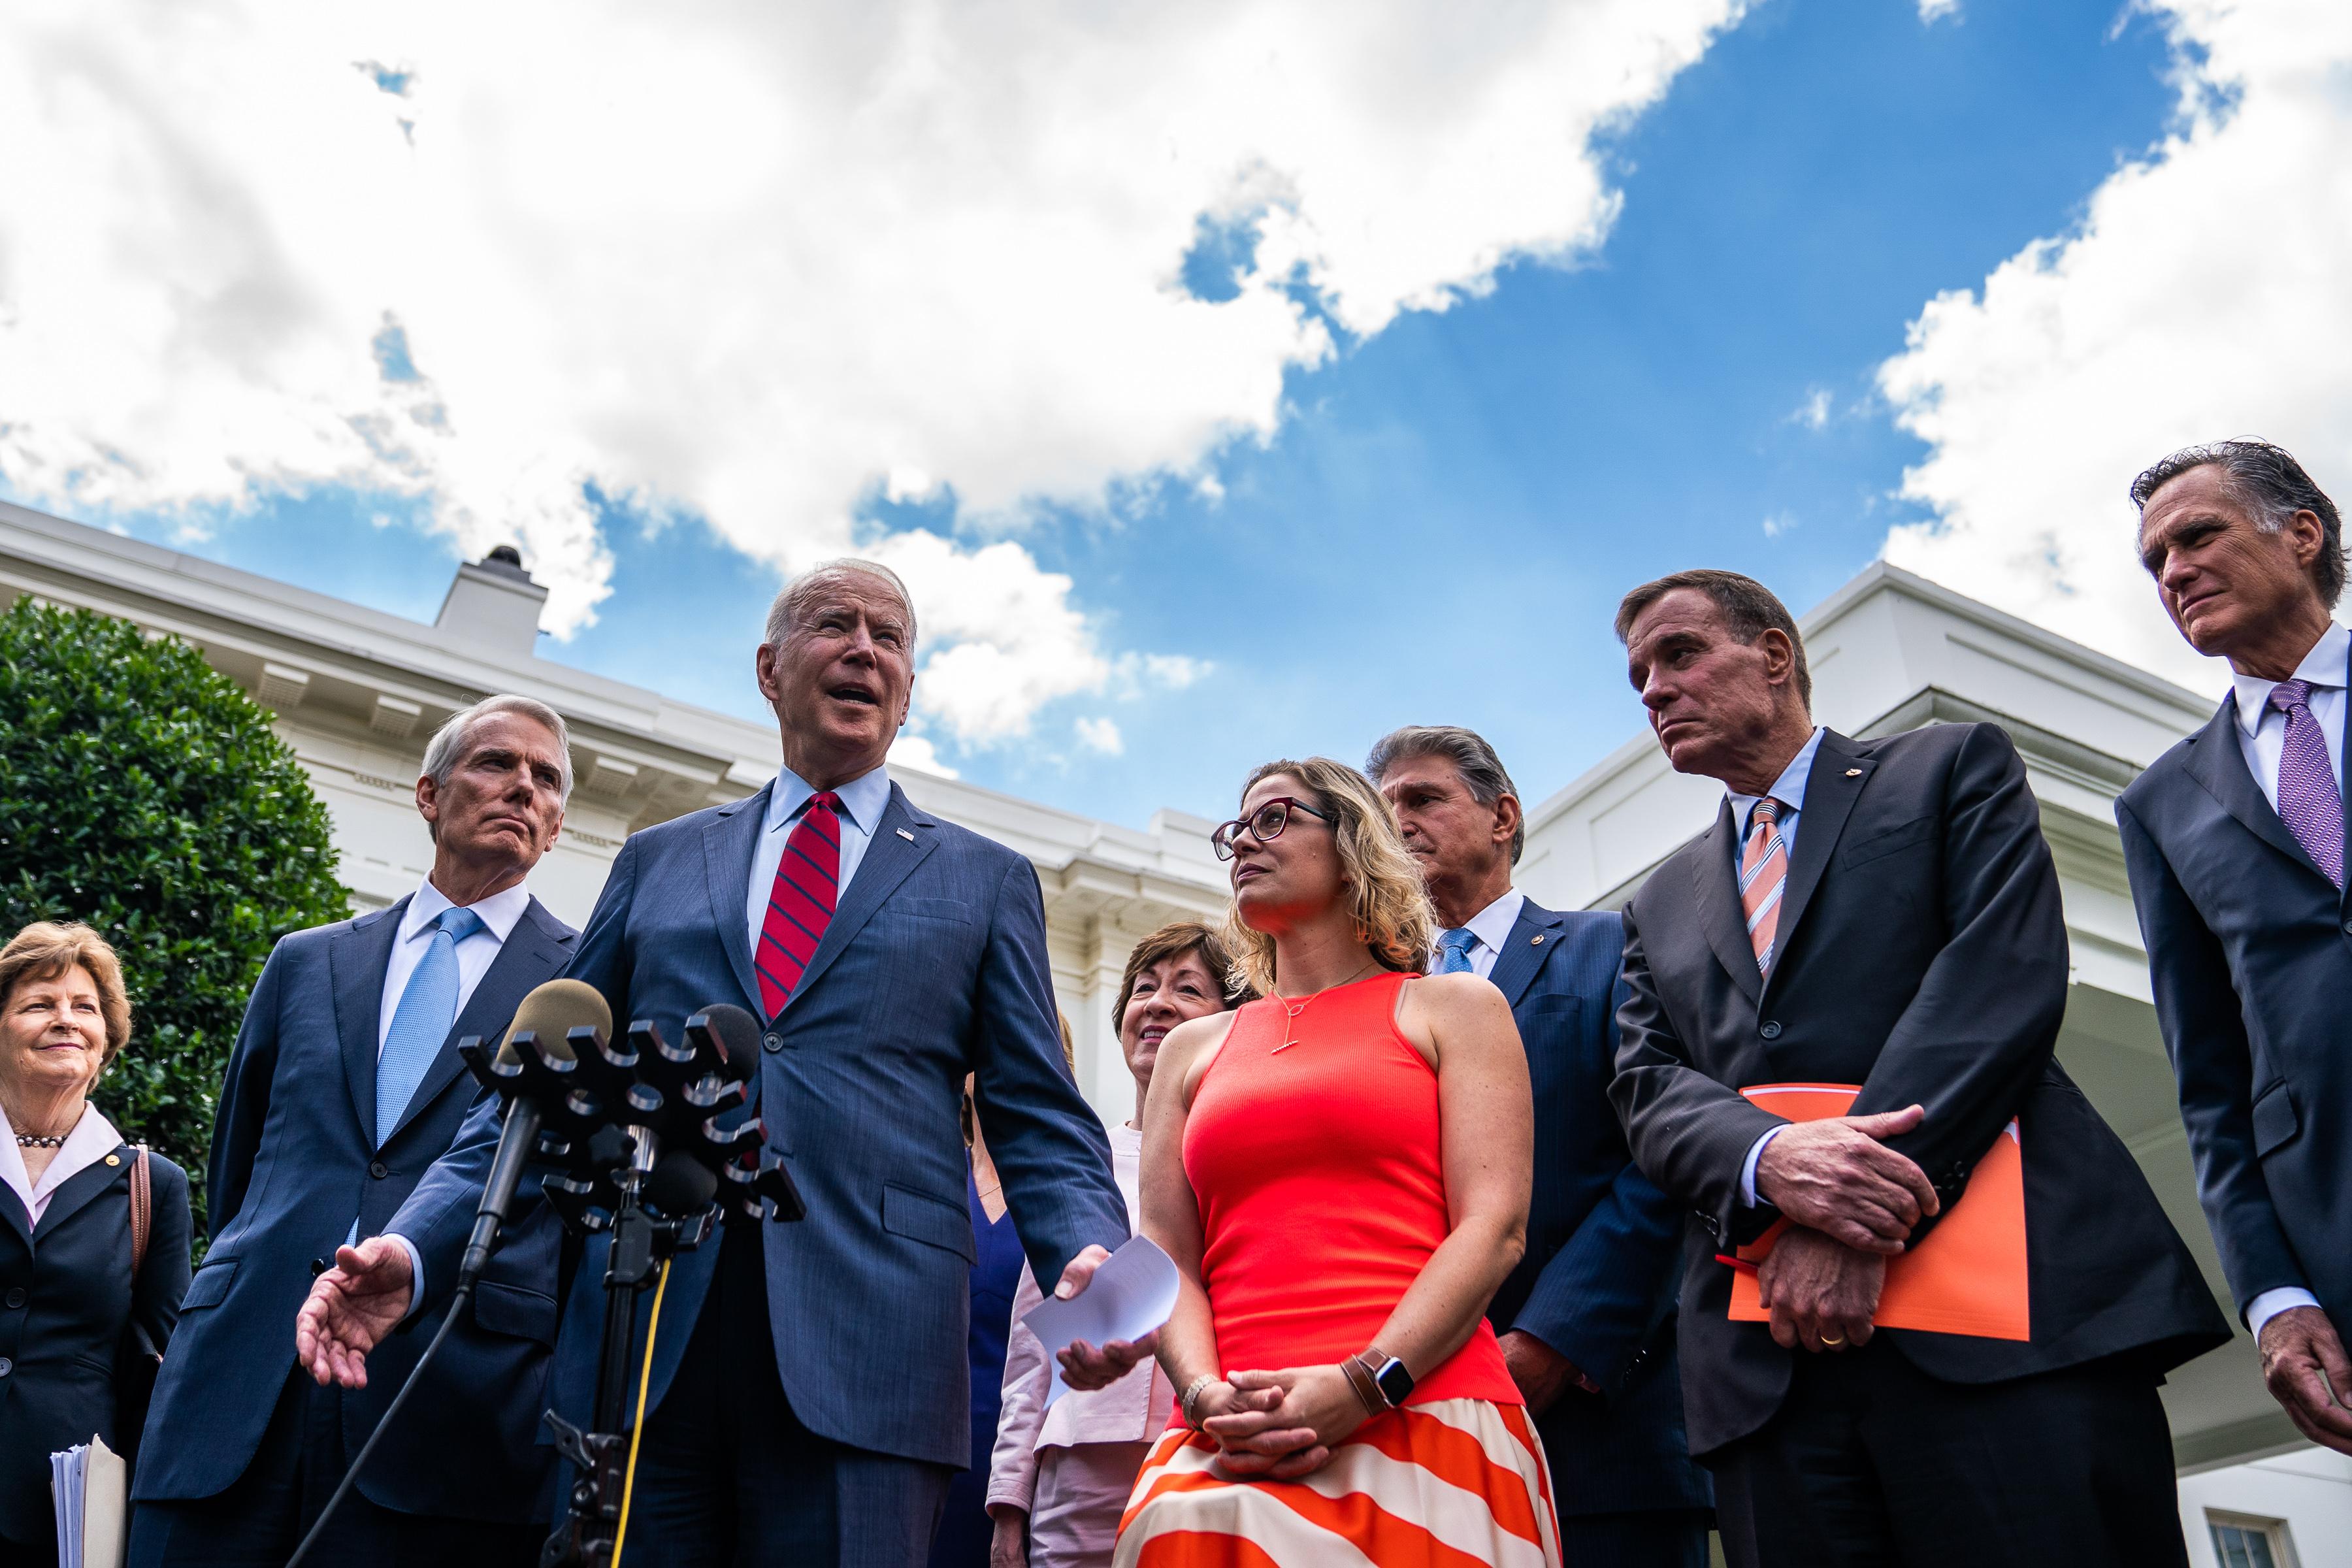 US President Joe Biden infrastructure negations